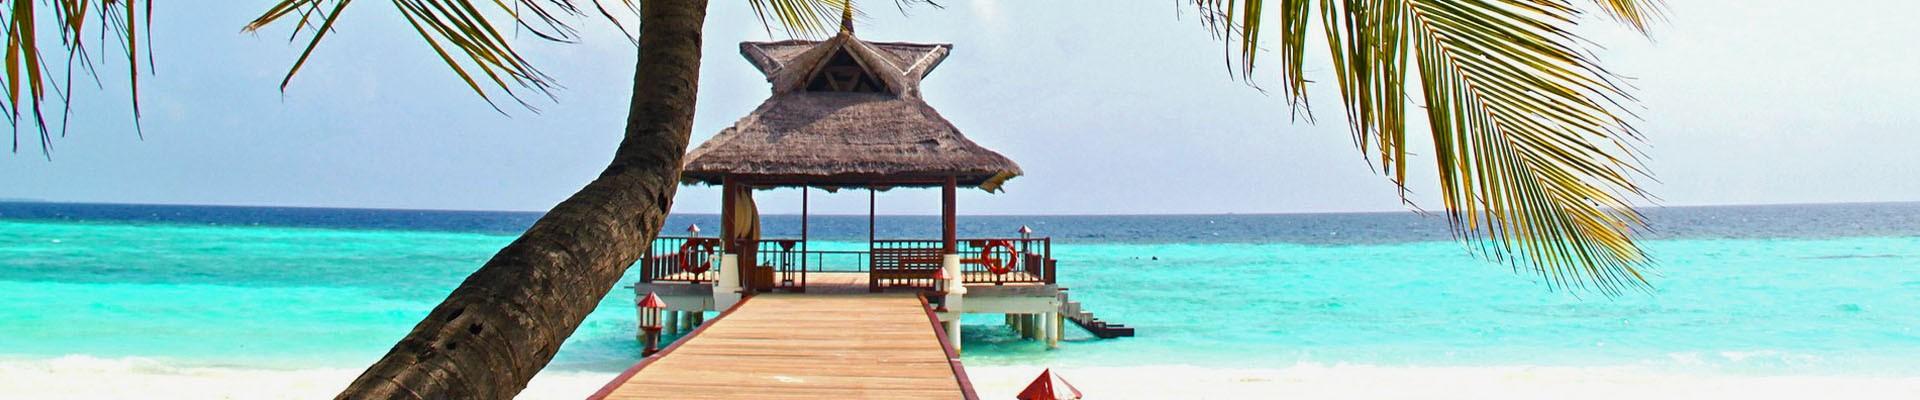 Bröllopsresa Maldiverna